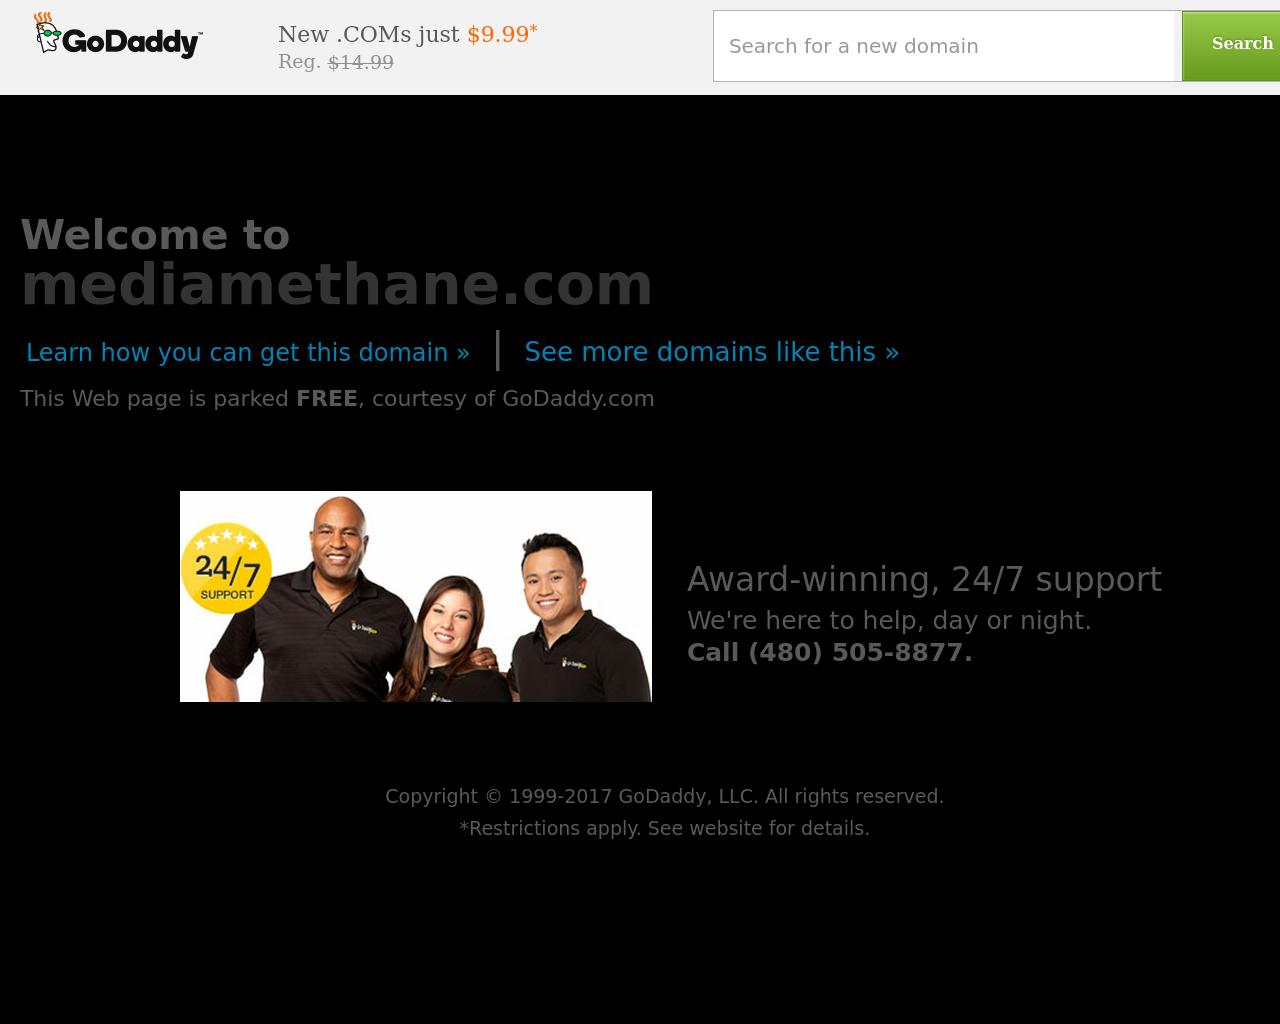 mediamethane-Advertising-Reviews-Pricing